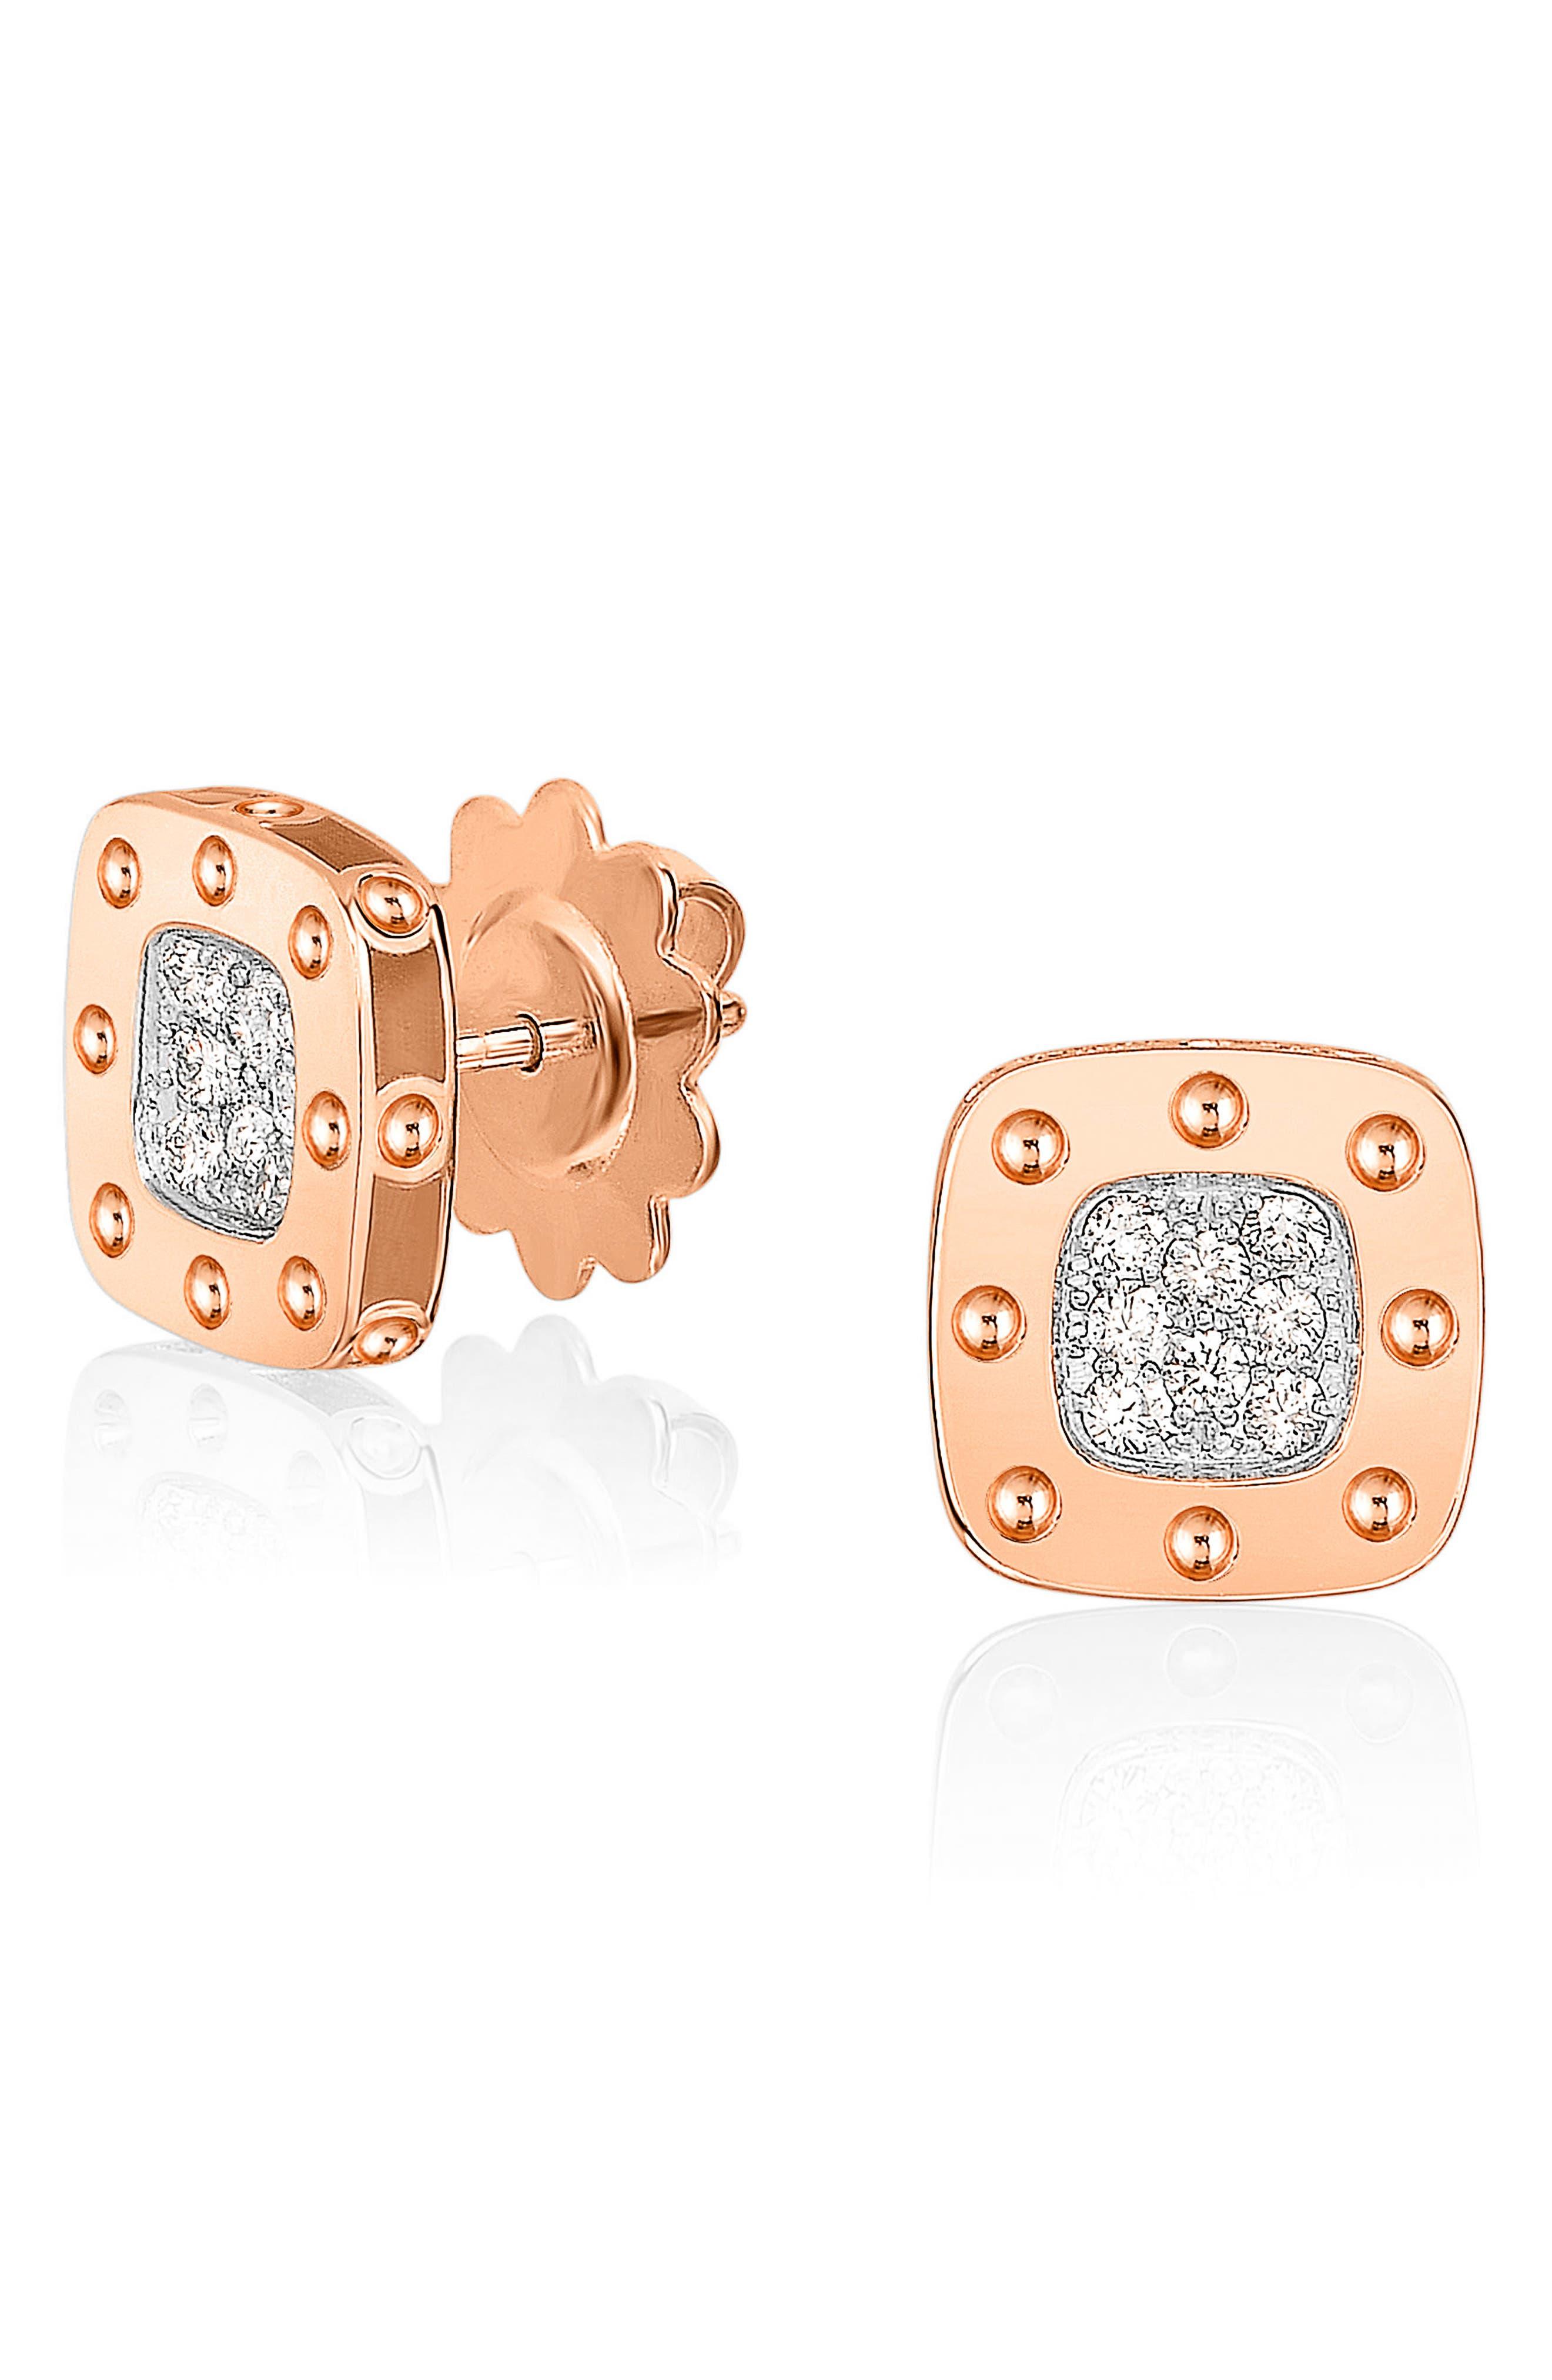 Main Image - Roberto Coin 'Pois Moi' Diamond Stud Earrings